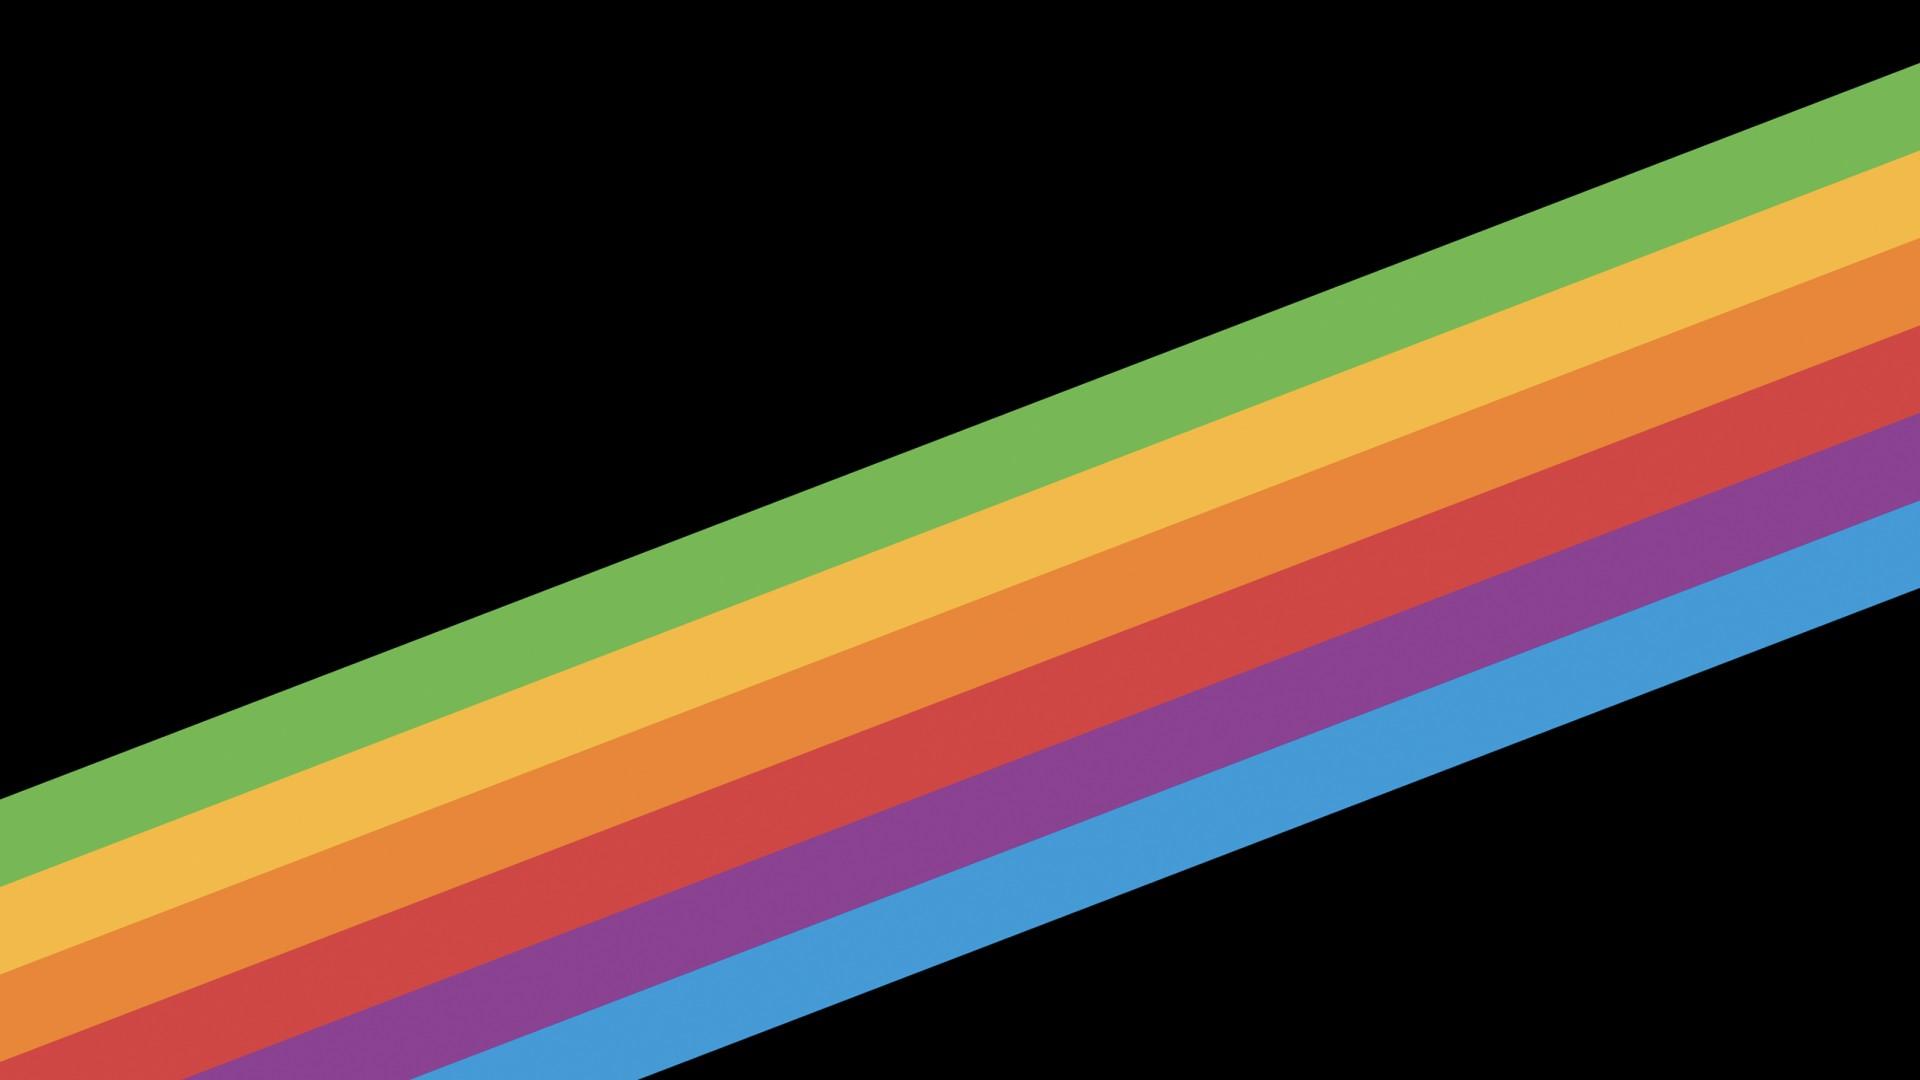 Wallpaper Iphone X Wallpapers Iphone 8 Ios11 Rainbow